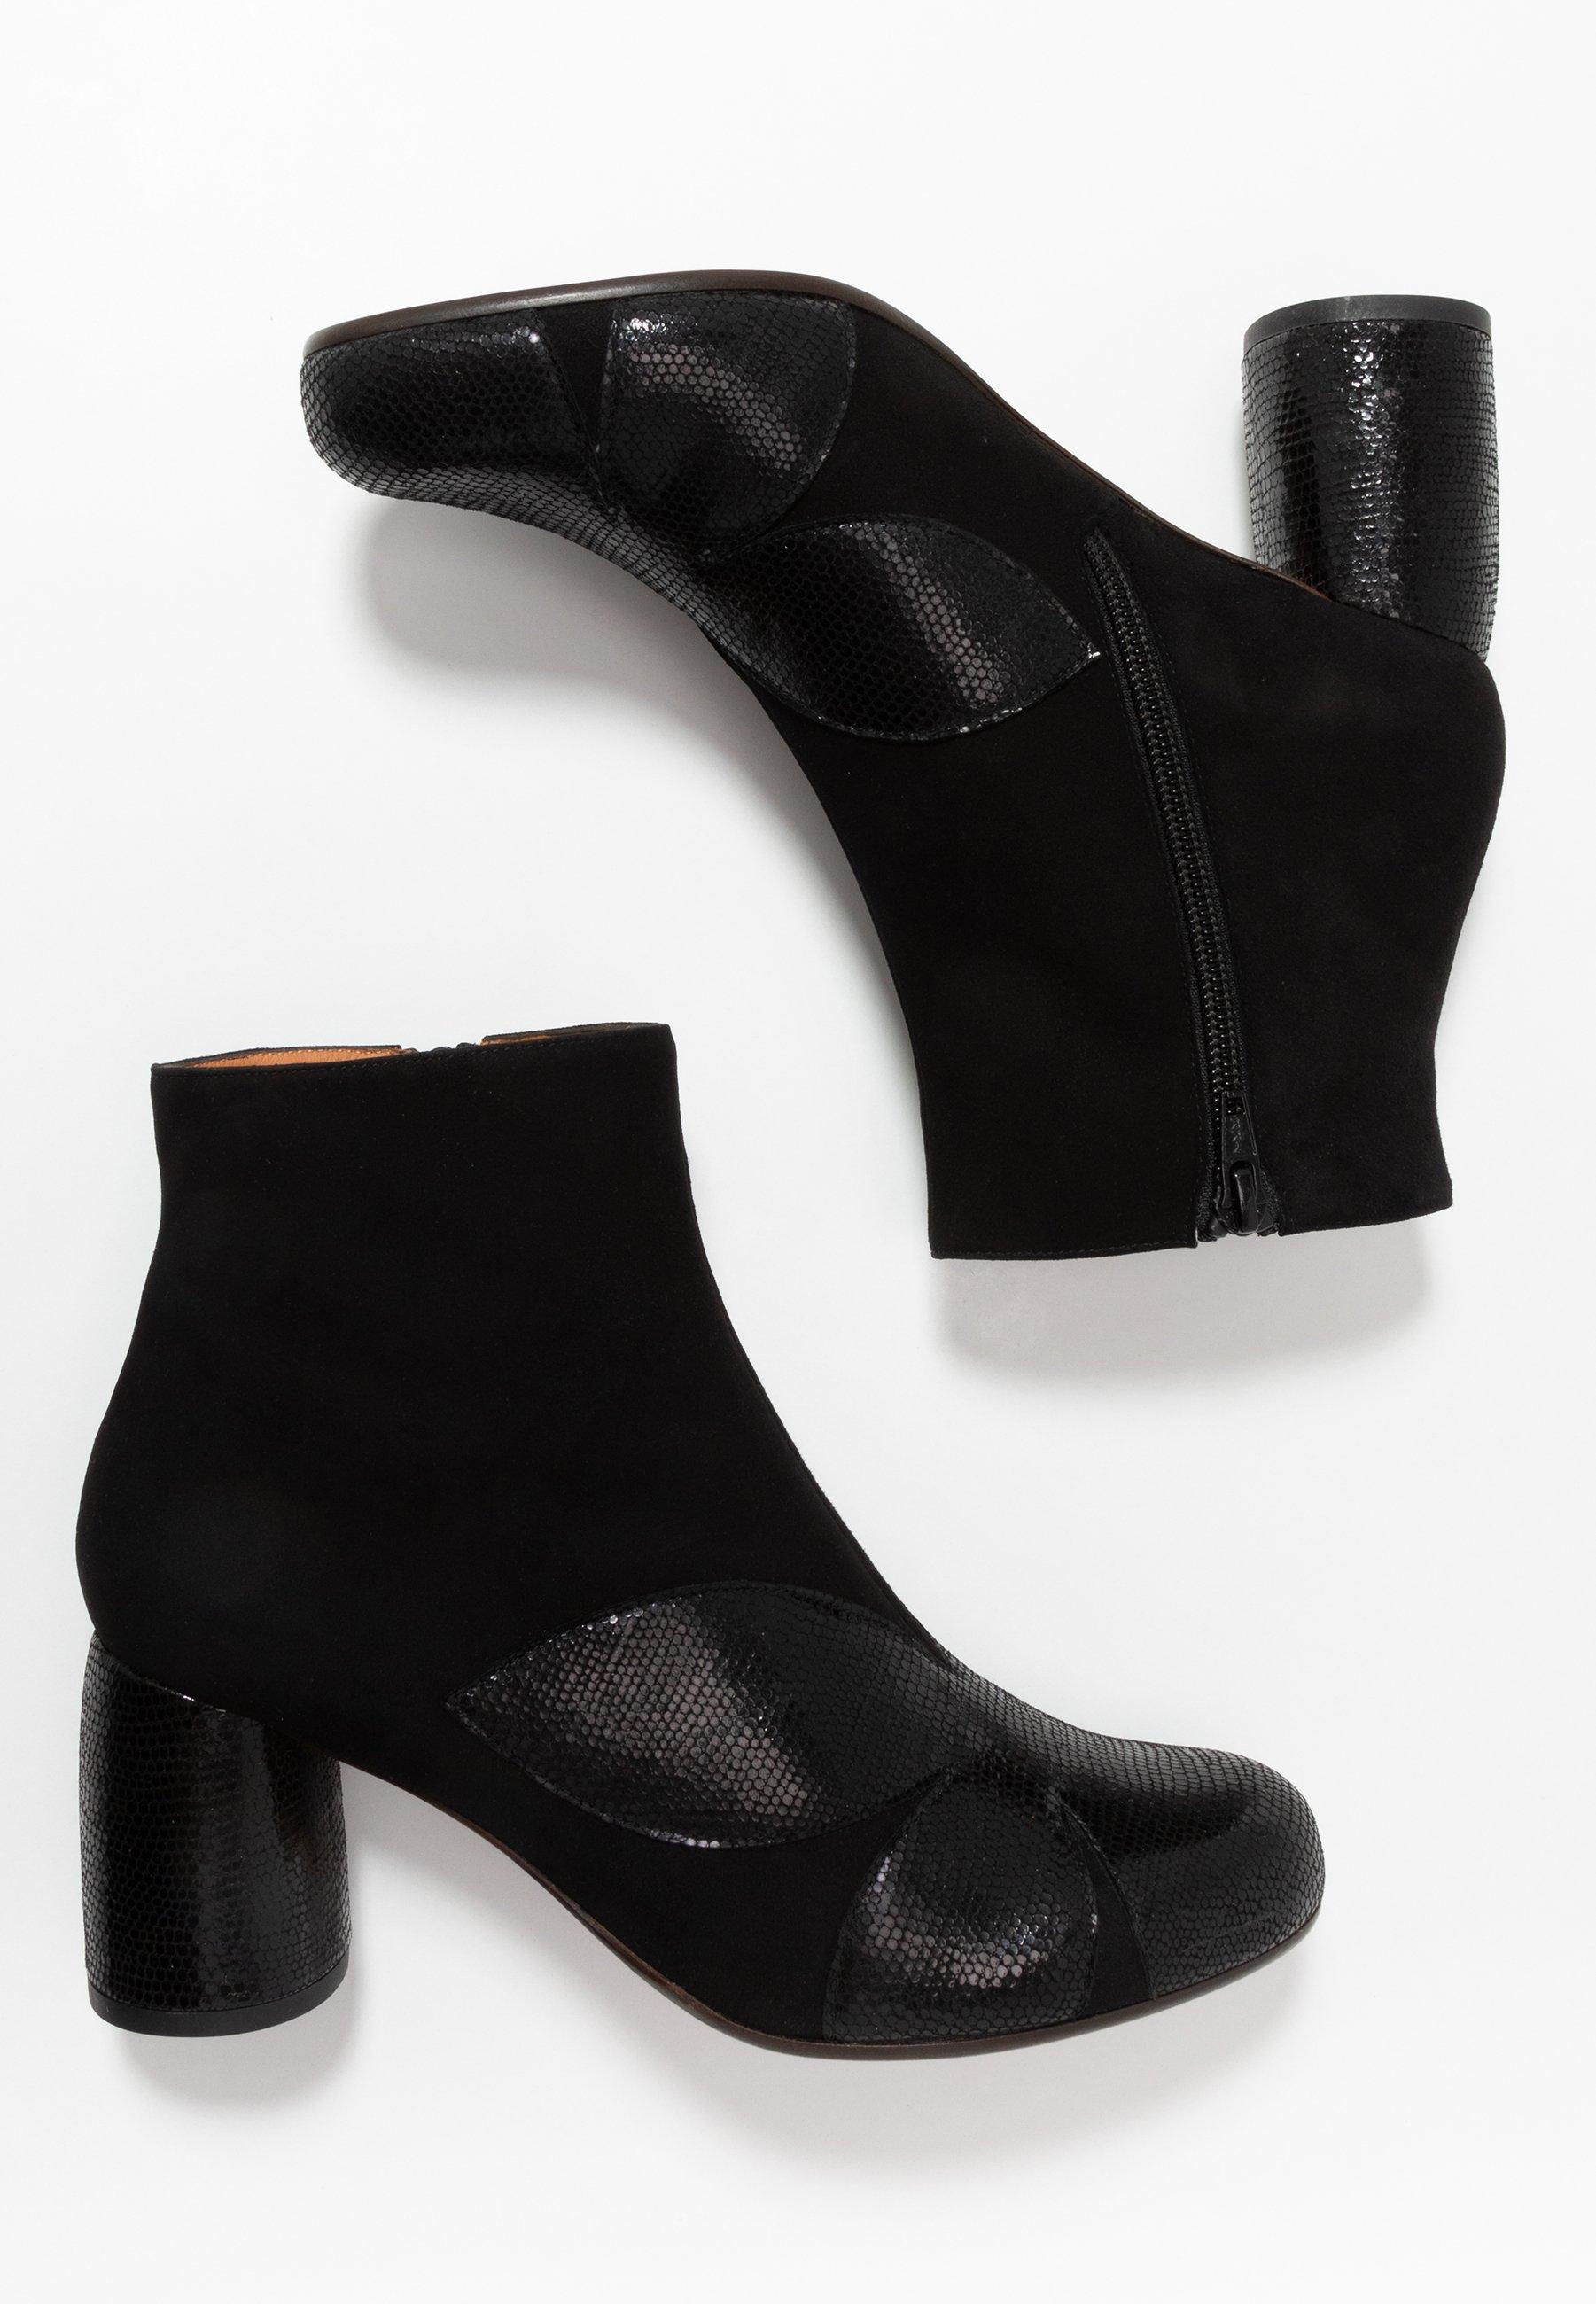 MOLAINA Ankelboots black